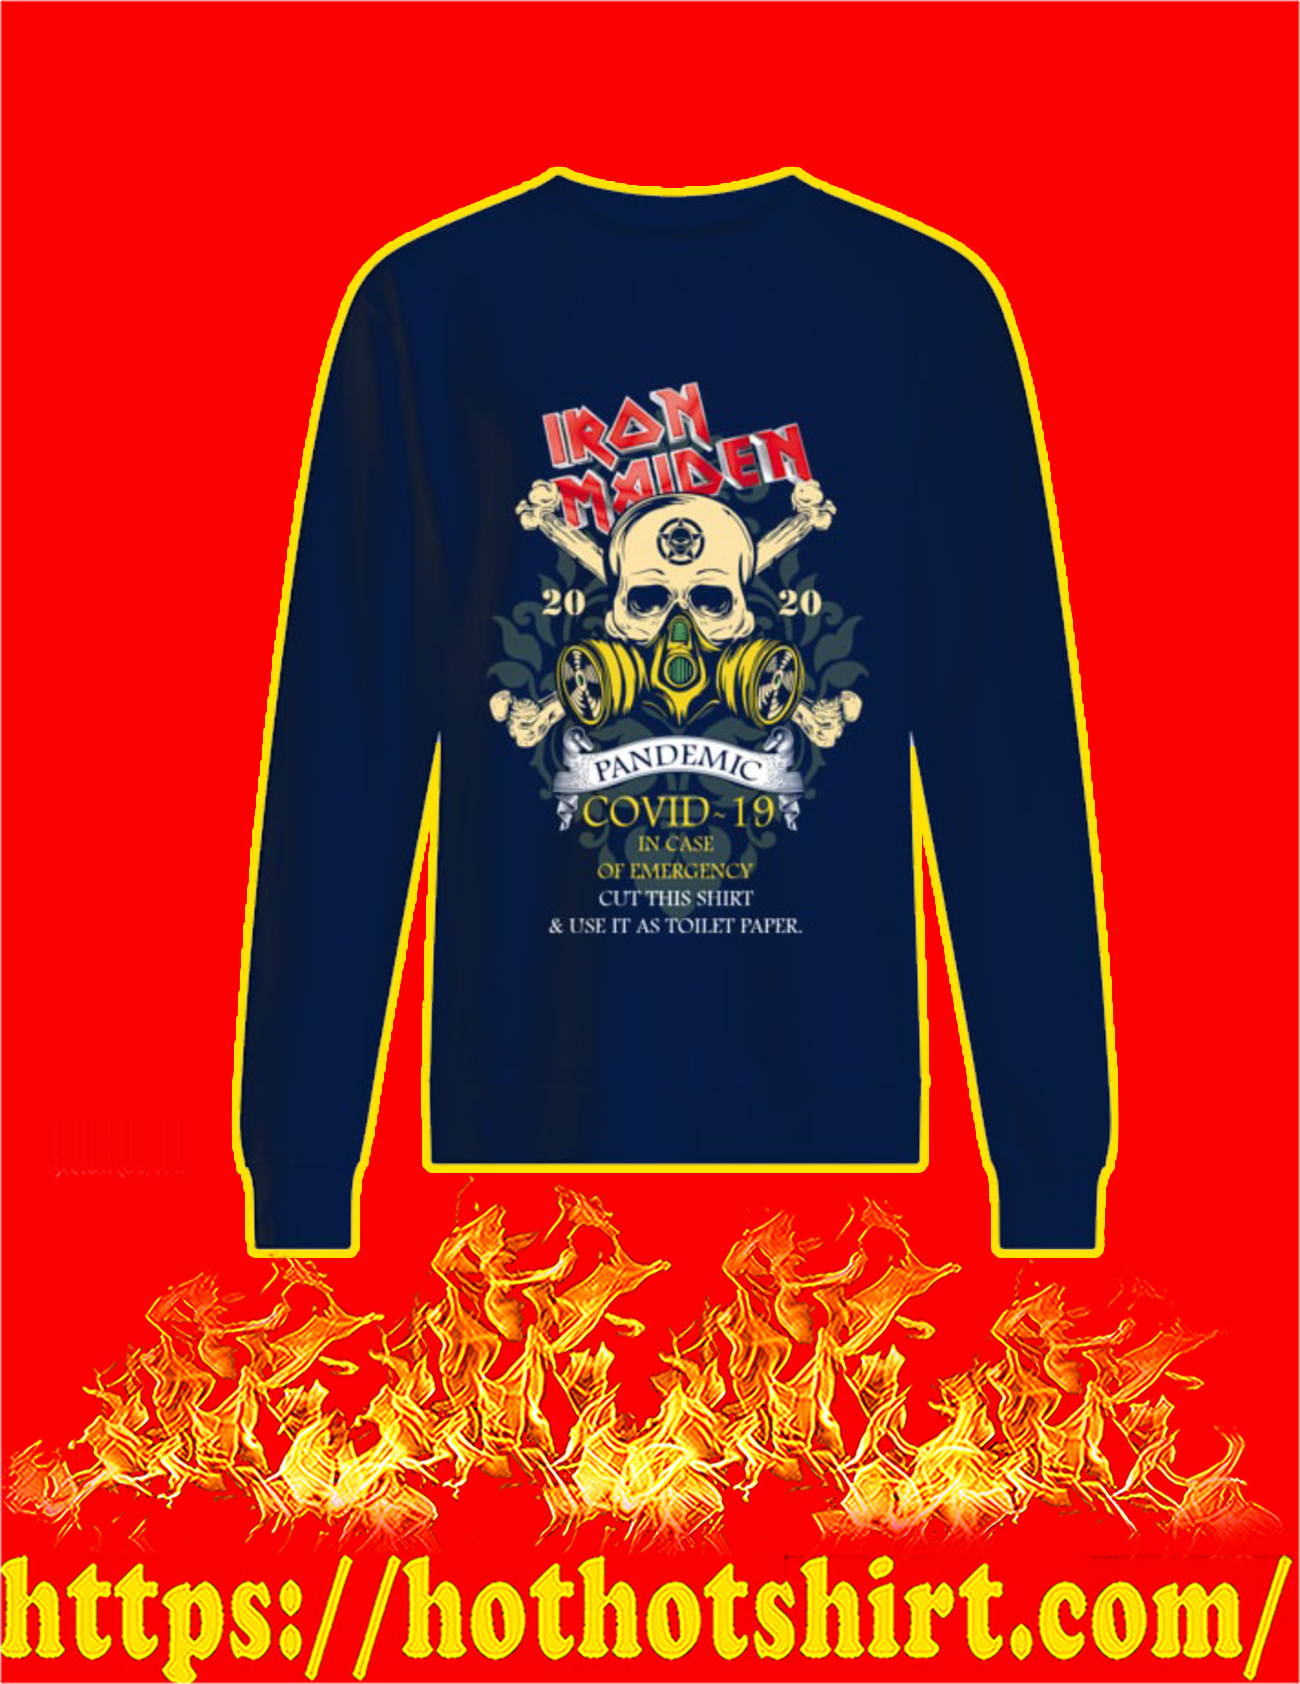 Iron Maiden Romance pandemic covid 19 in case sweatshirt